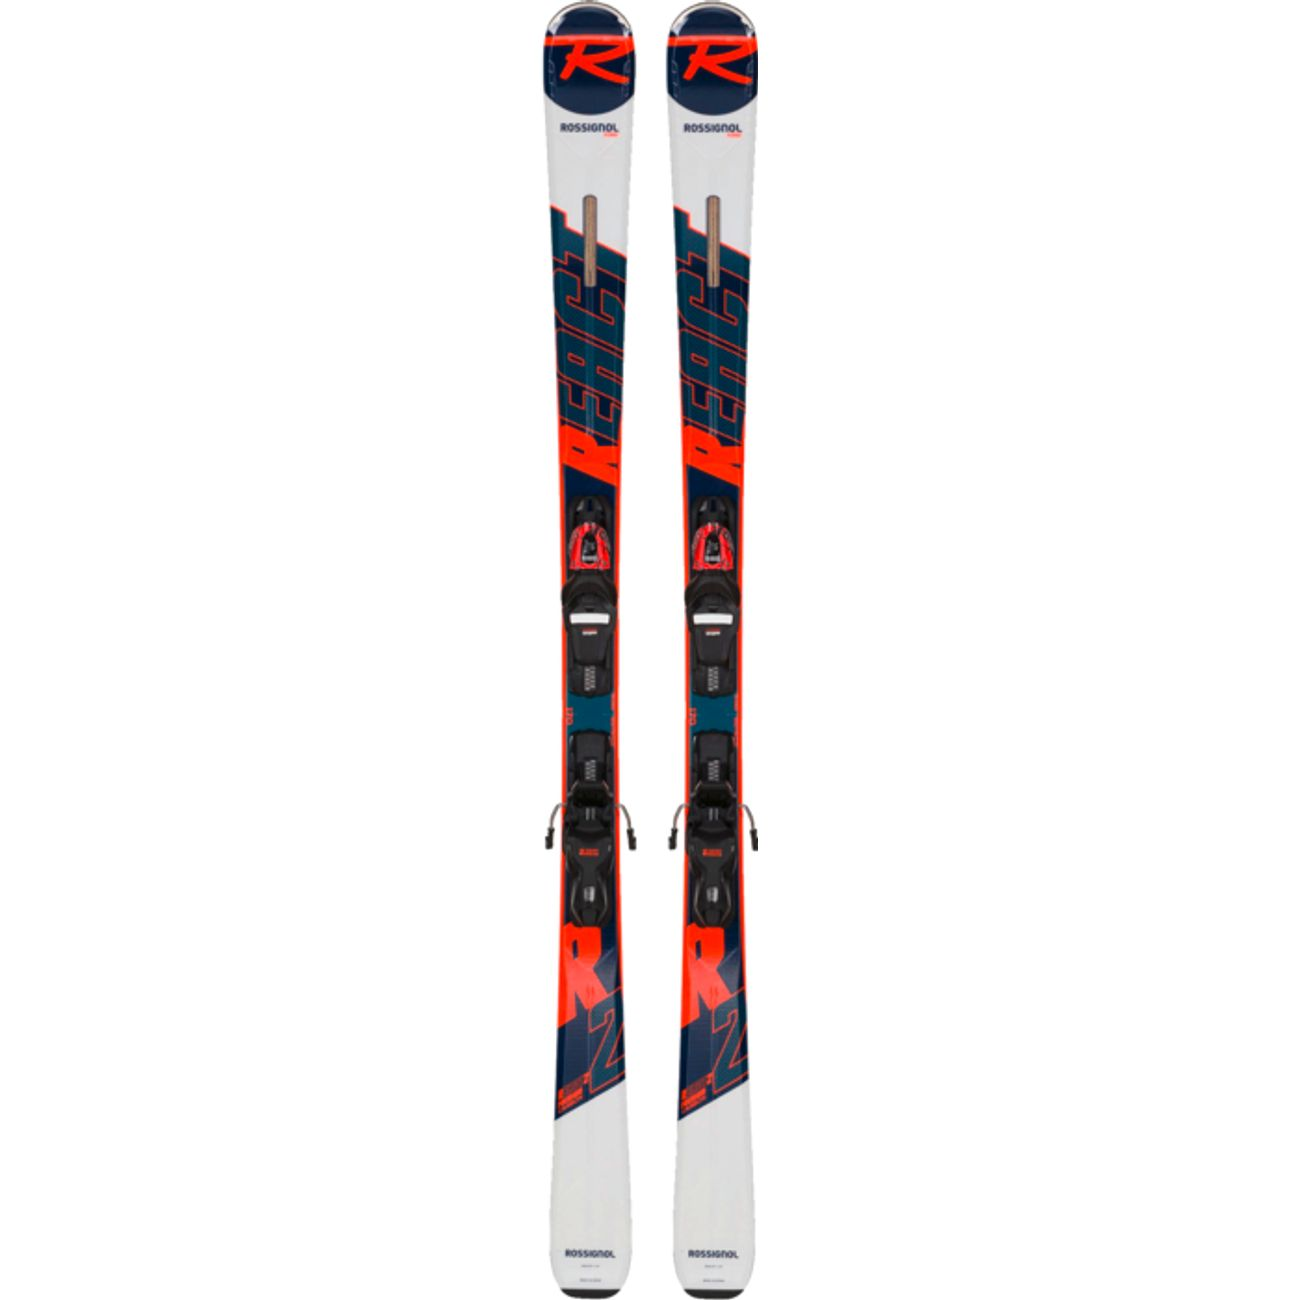 SKIS Ski adulte ROSSIGNOL REACT R2 XPRESS 10 B83